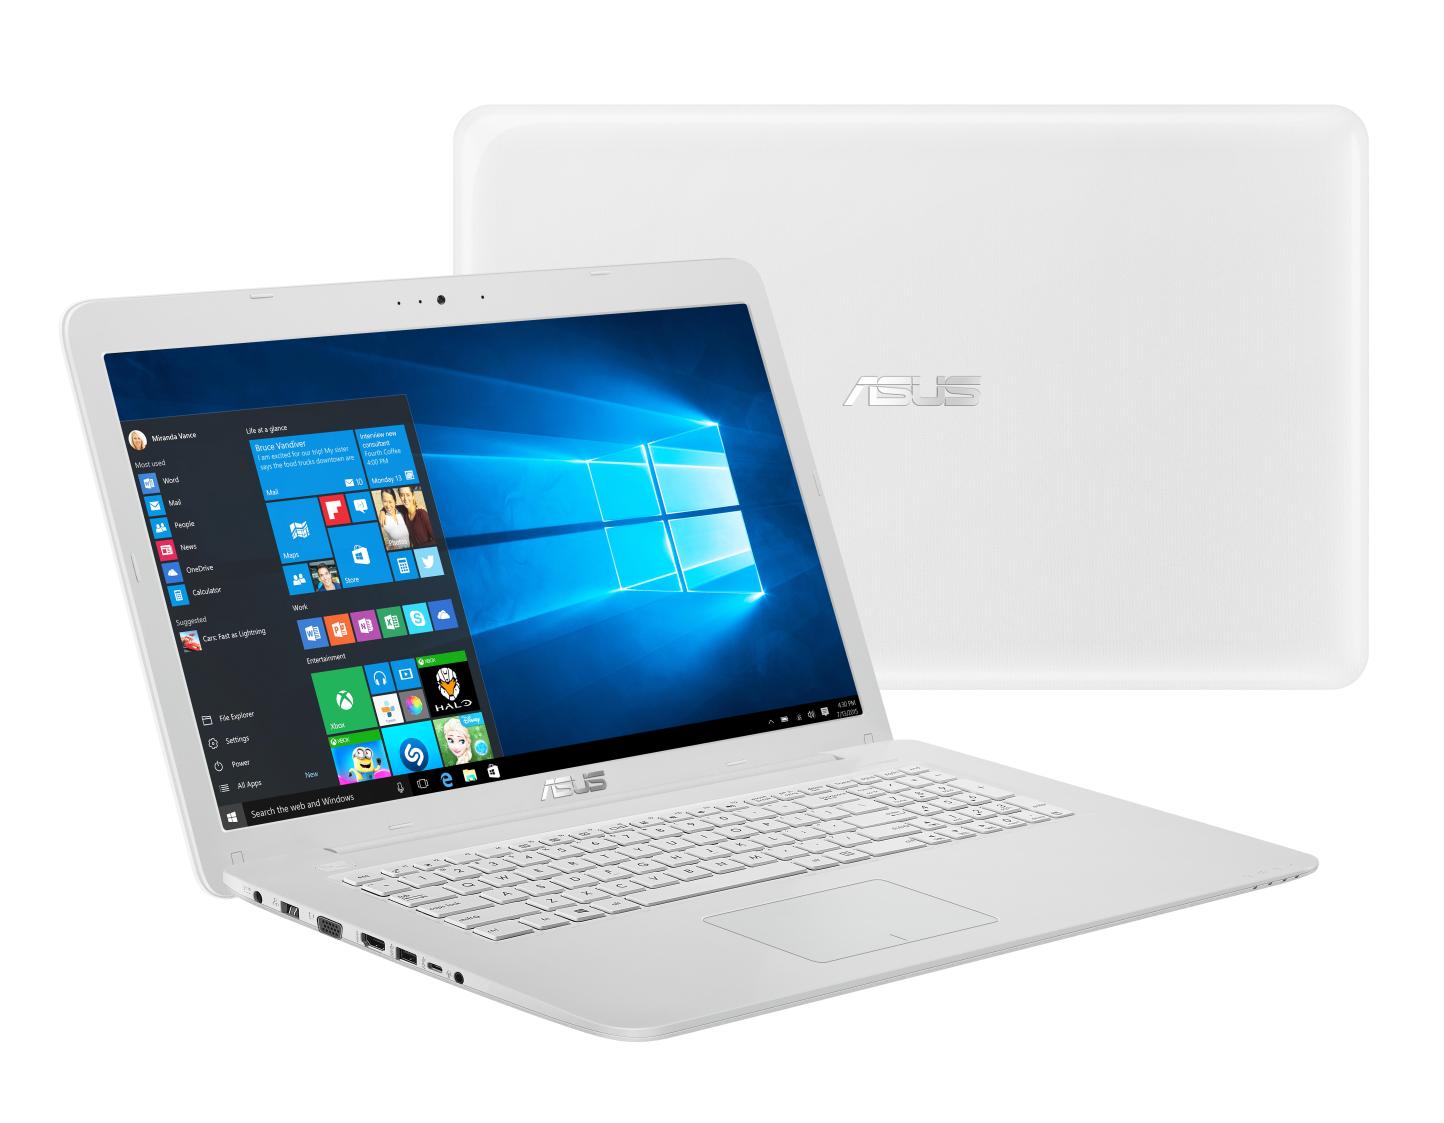 "ASUS NB F756UB - i7-6500U@2.5GHz, 17.3"" matný LED FHD, nV GT940M 2G, 8GB, 2TB54+16GB SSD, DVD, WiFi, BT, W10, bílá"